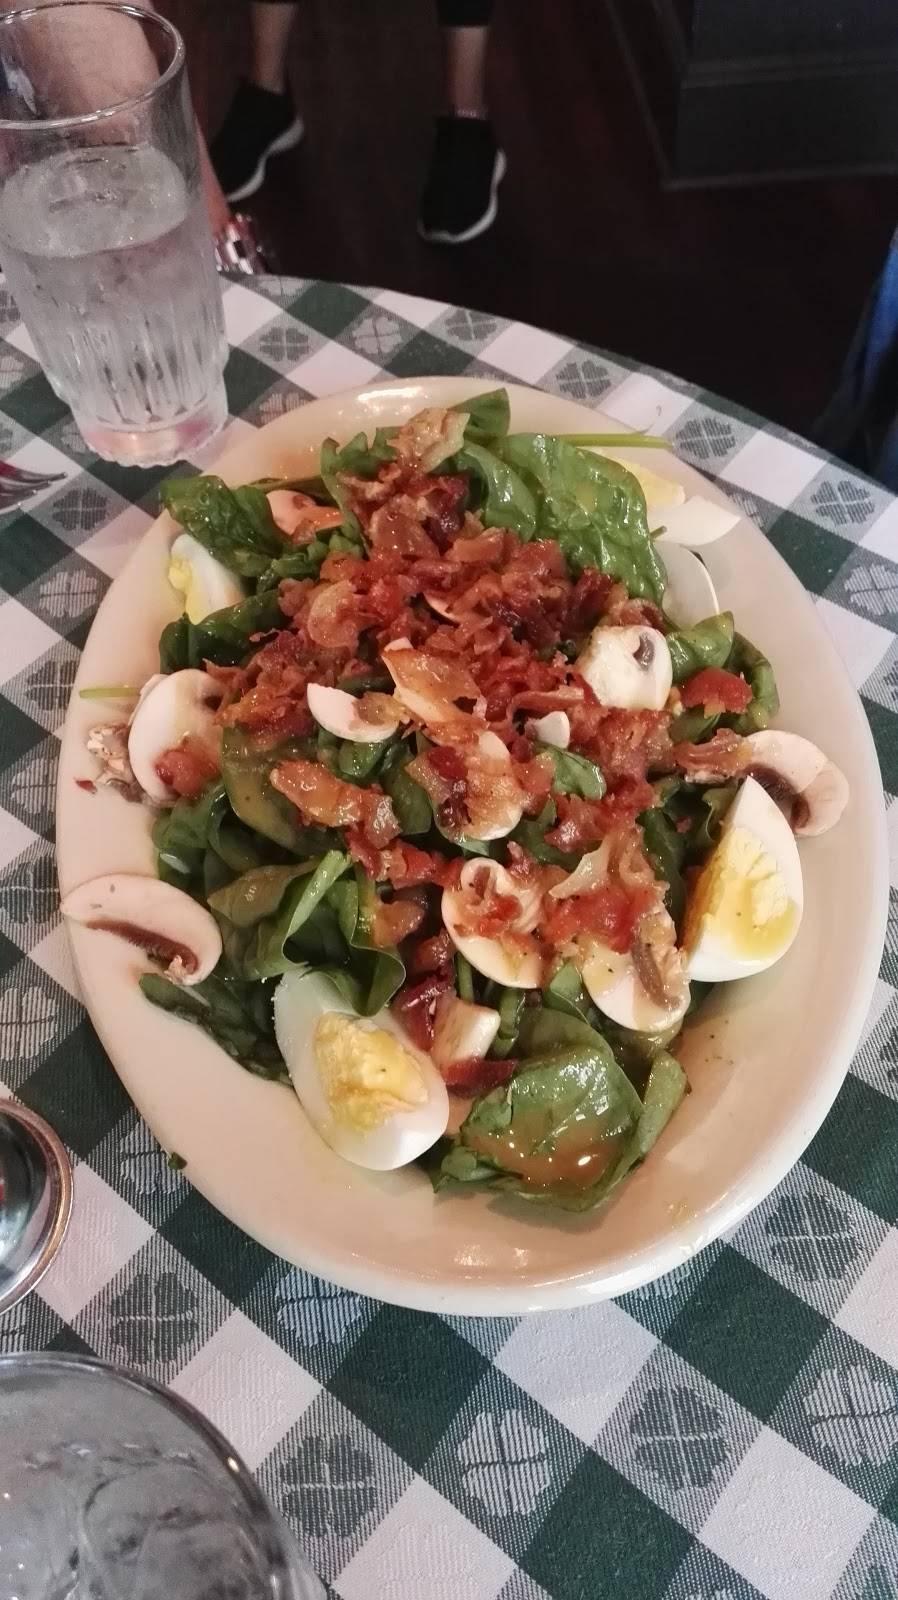 JG Melon   restaurant   480 Amsterdam Ave, New York, NY 10024, USA   6468959388 OR +1 646-895-9388